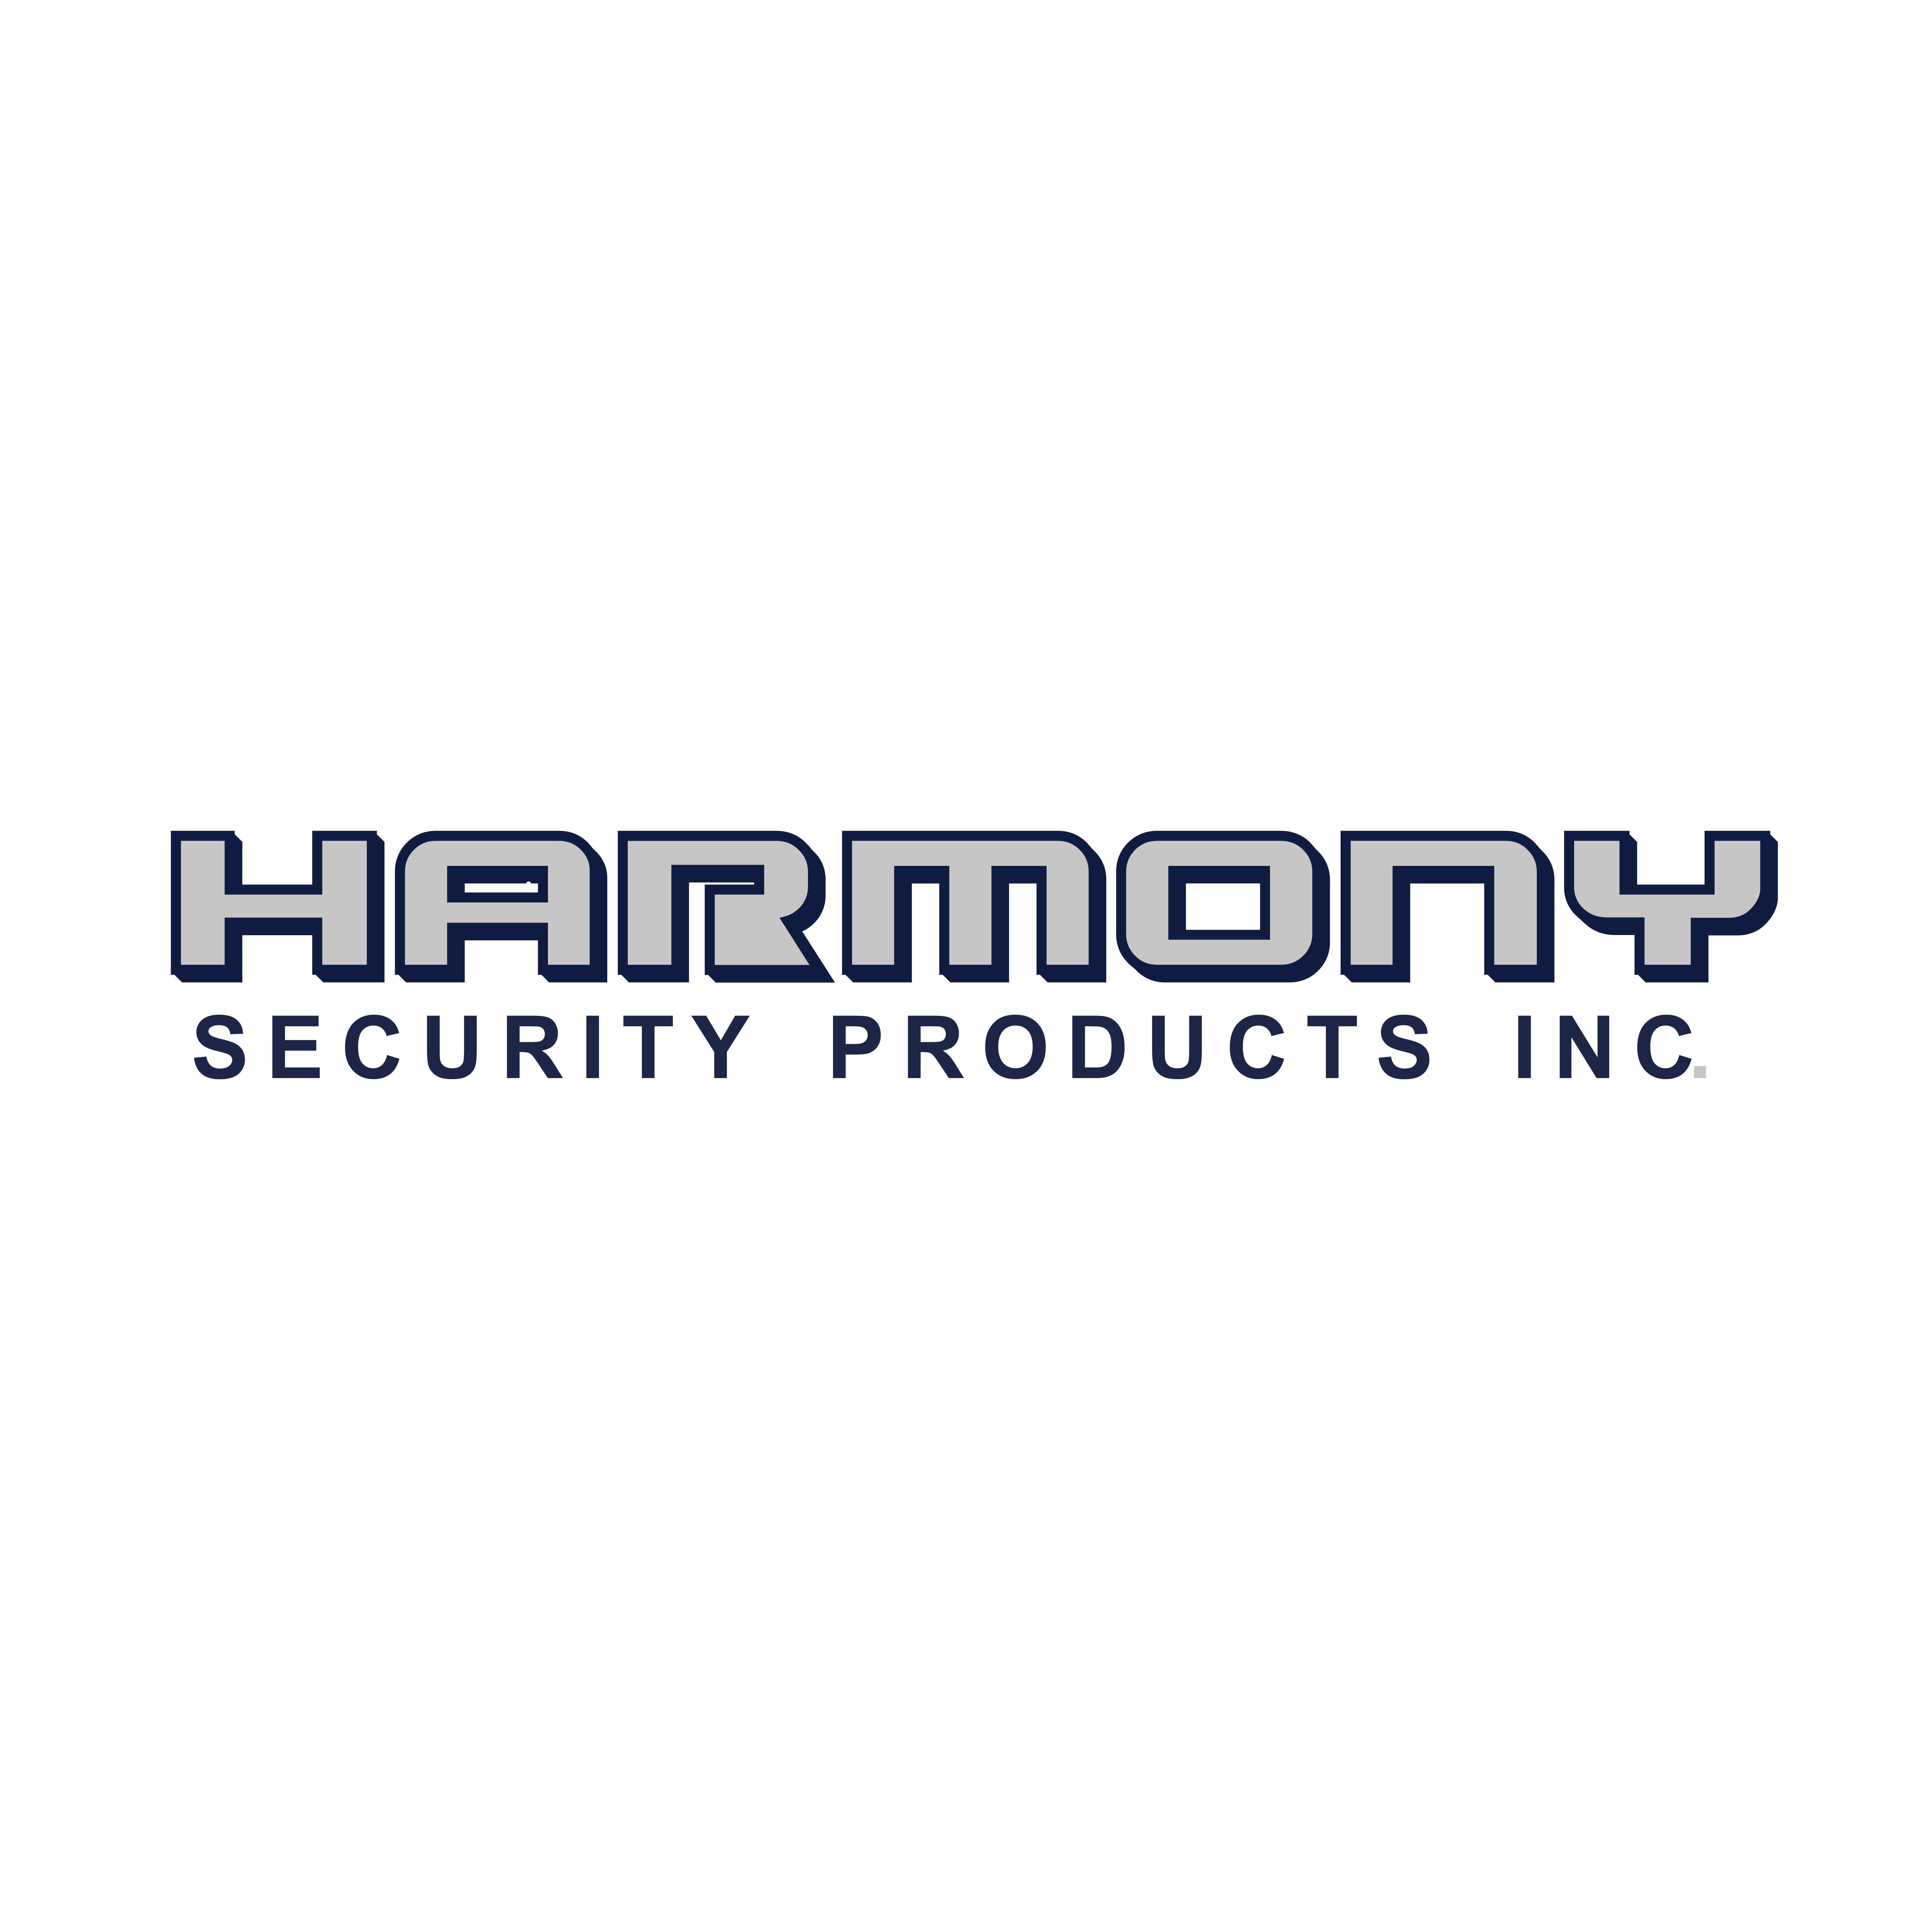 Harmony Security Products Logo